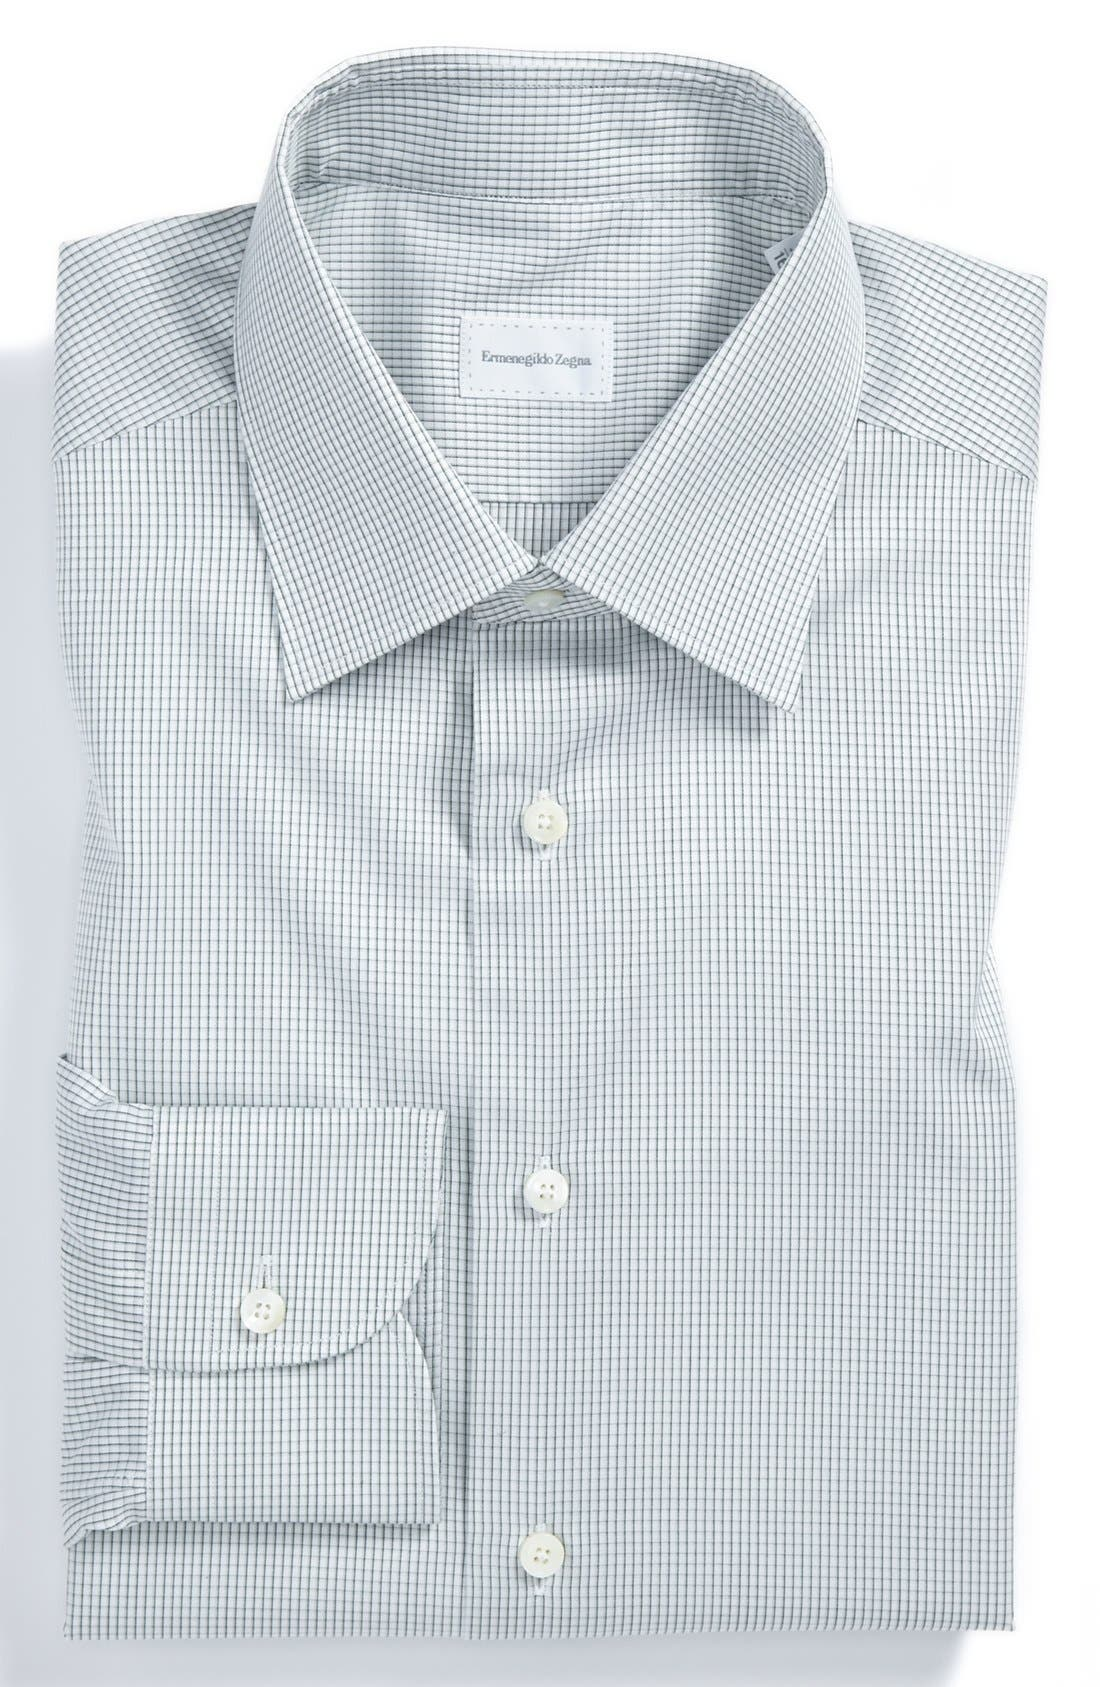 Regular Fit Dress Shirt,                         Main,                         color, Green